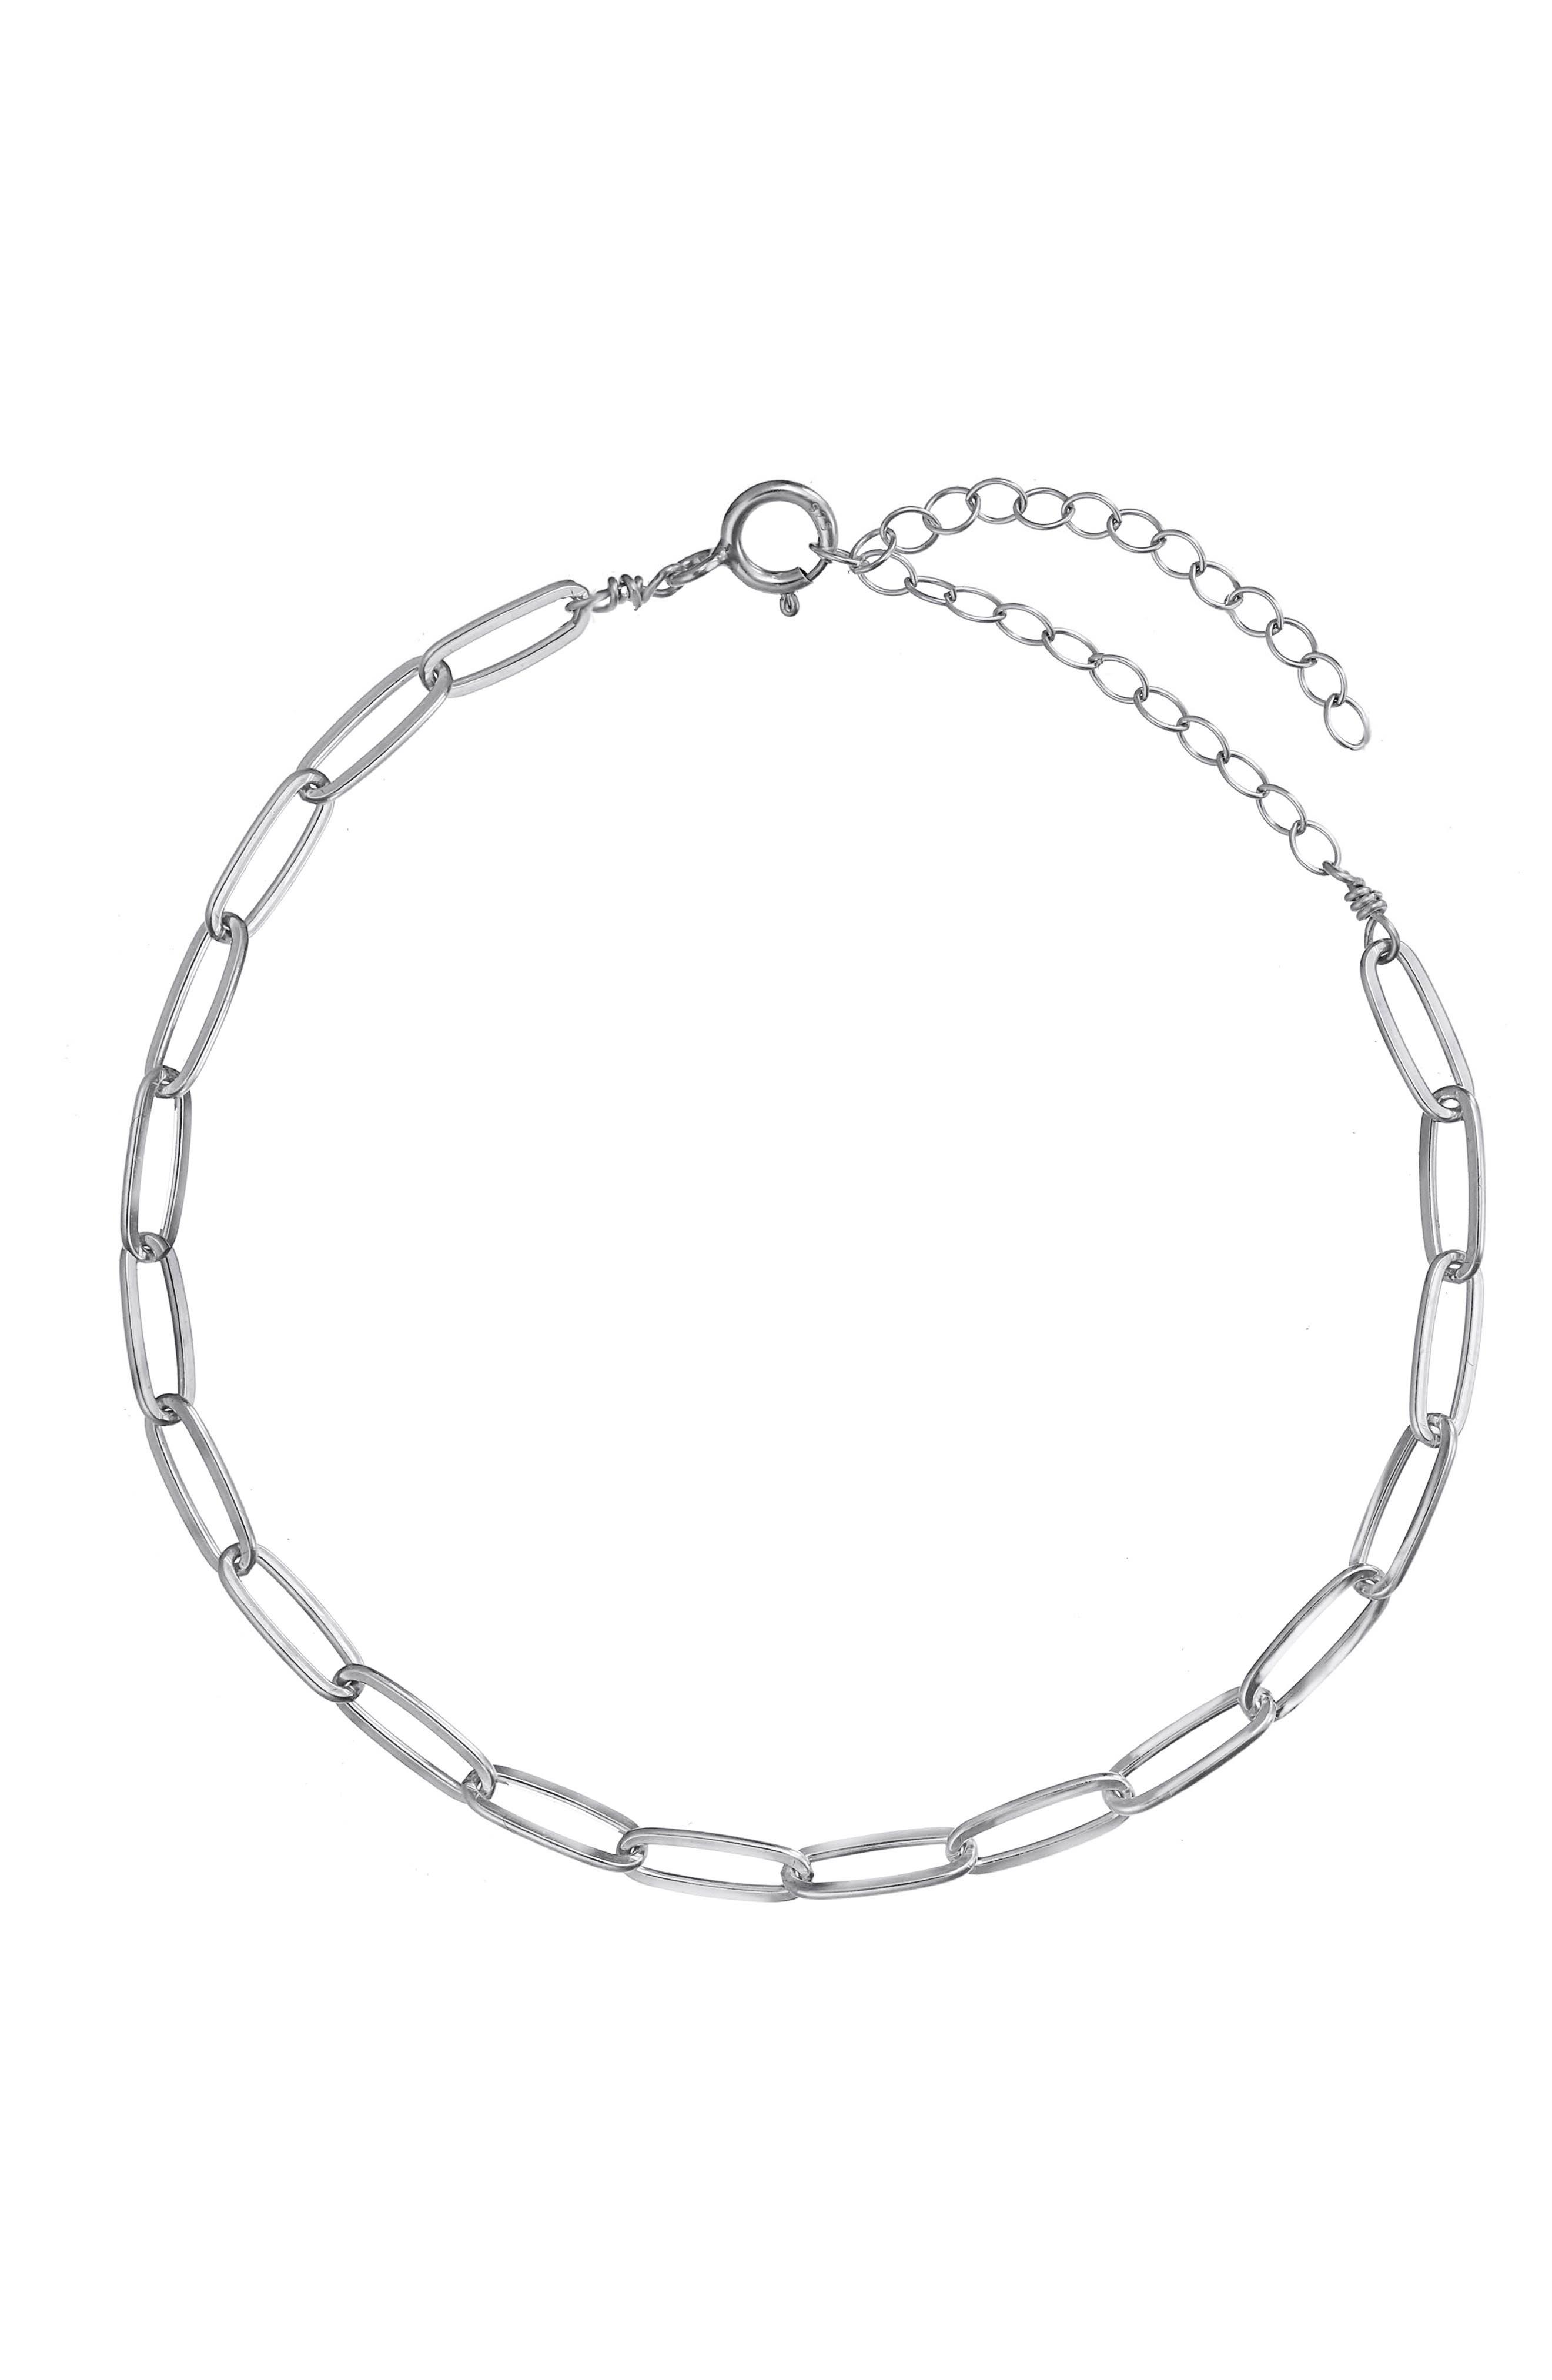 Norita Chain Link Bracelet